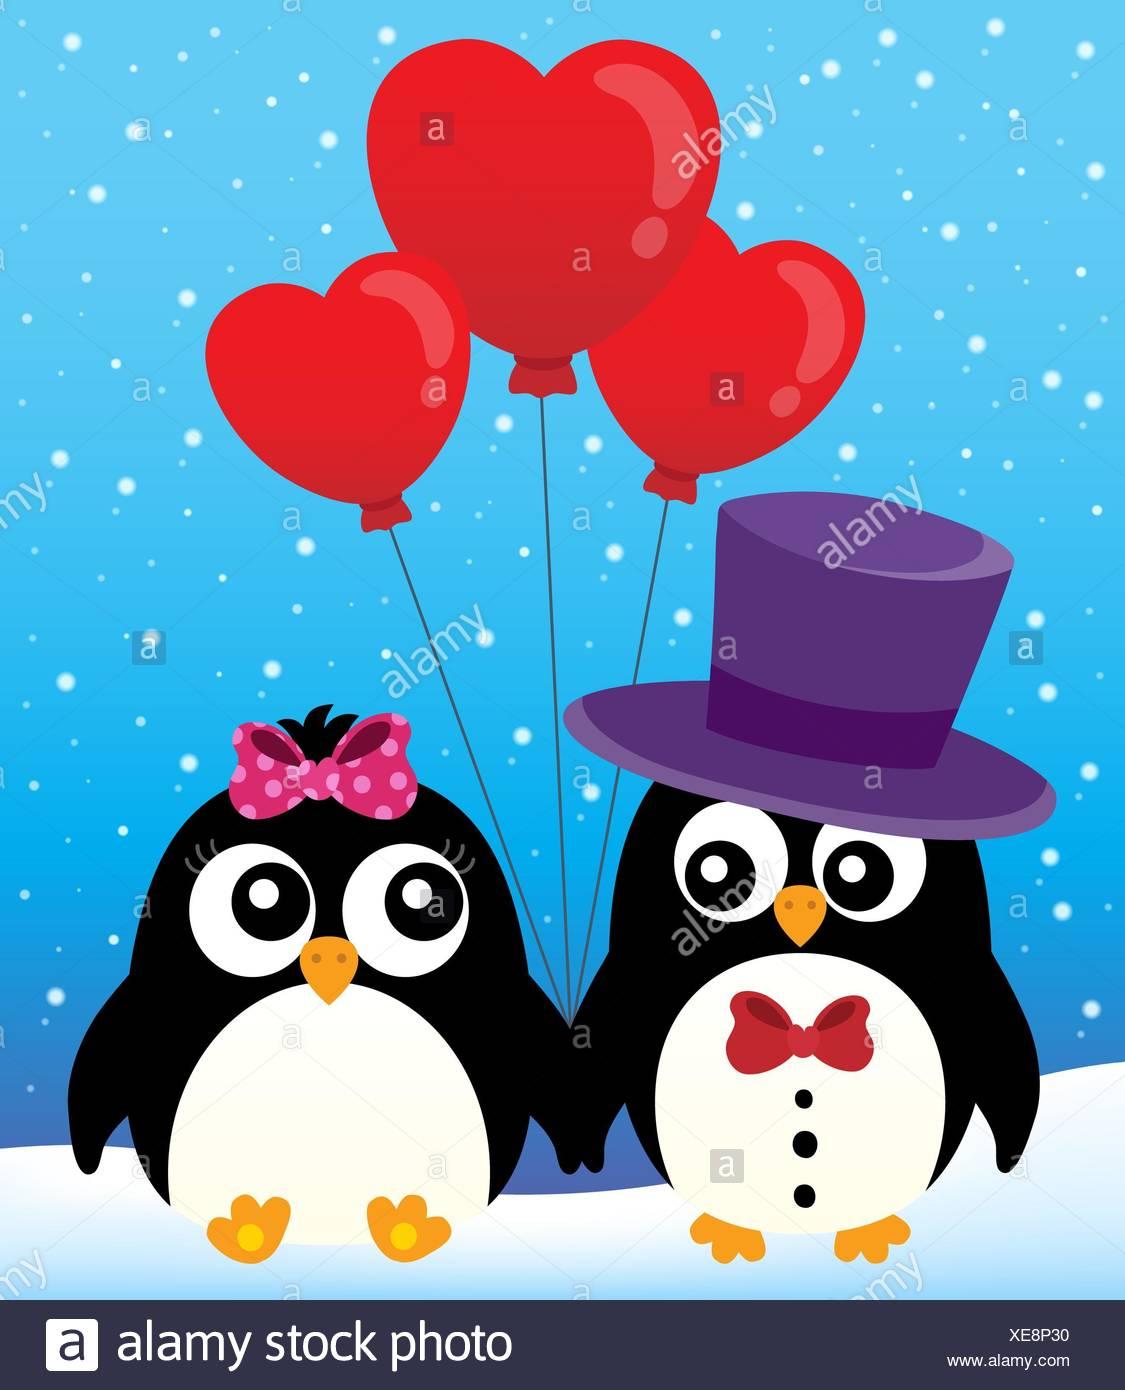 Valentine penguins theme image 2 - Stock Image